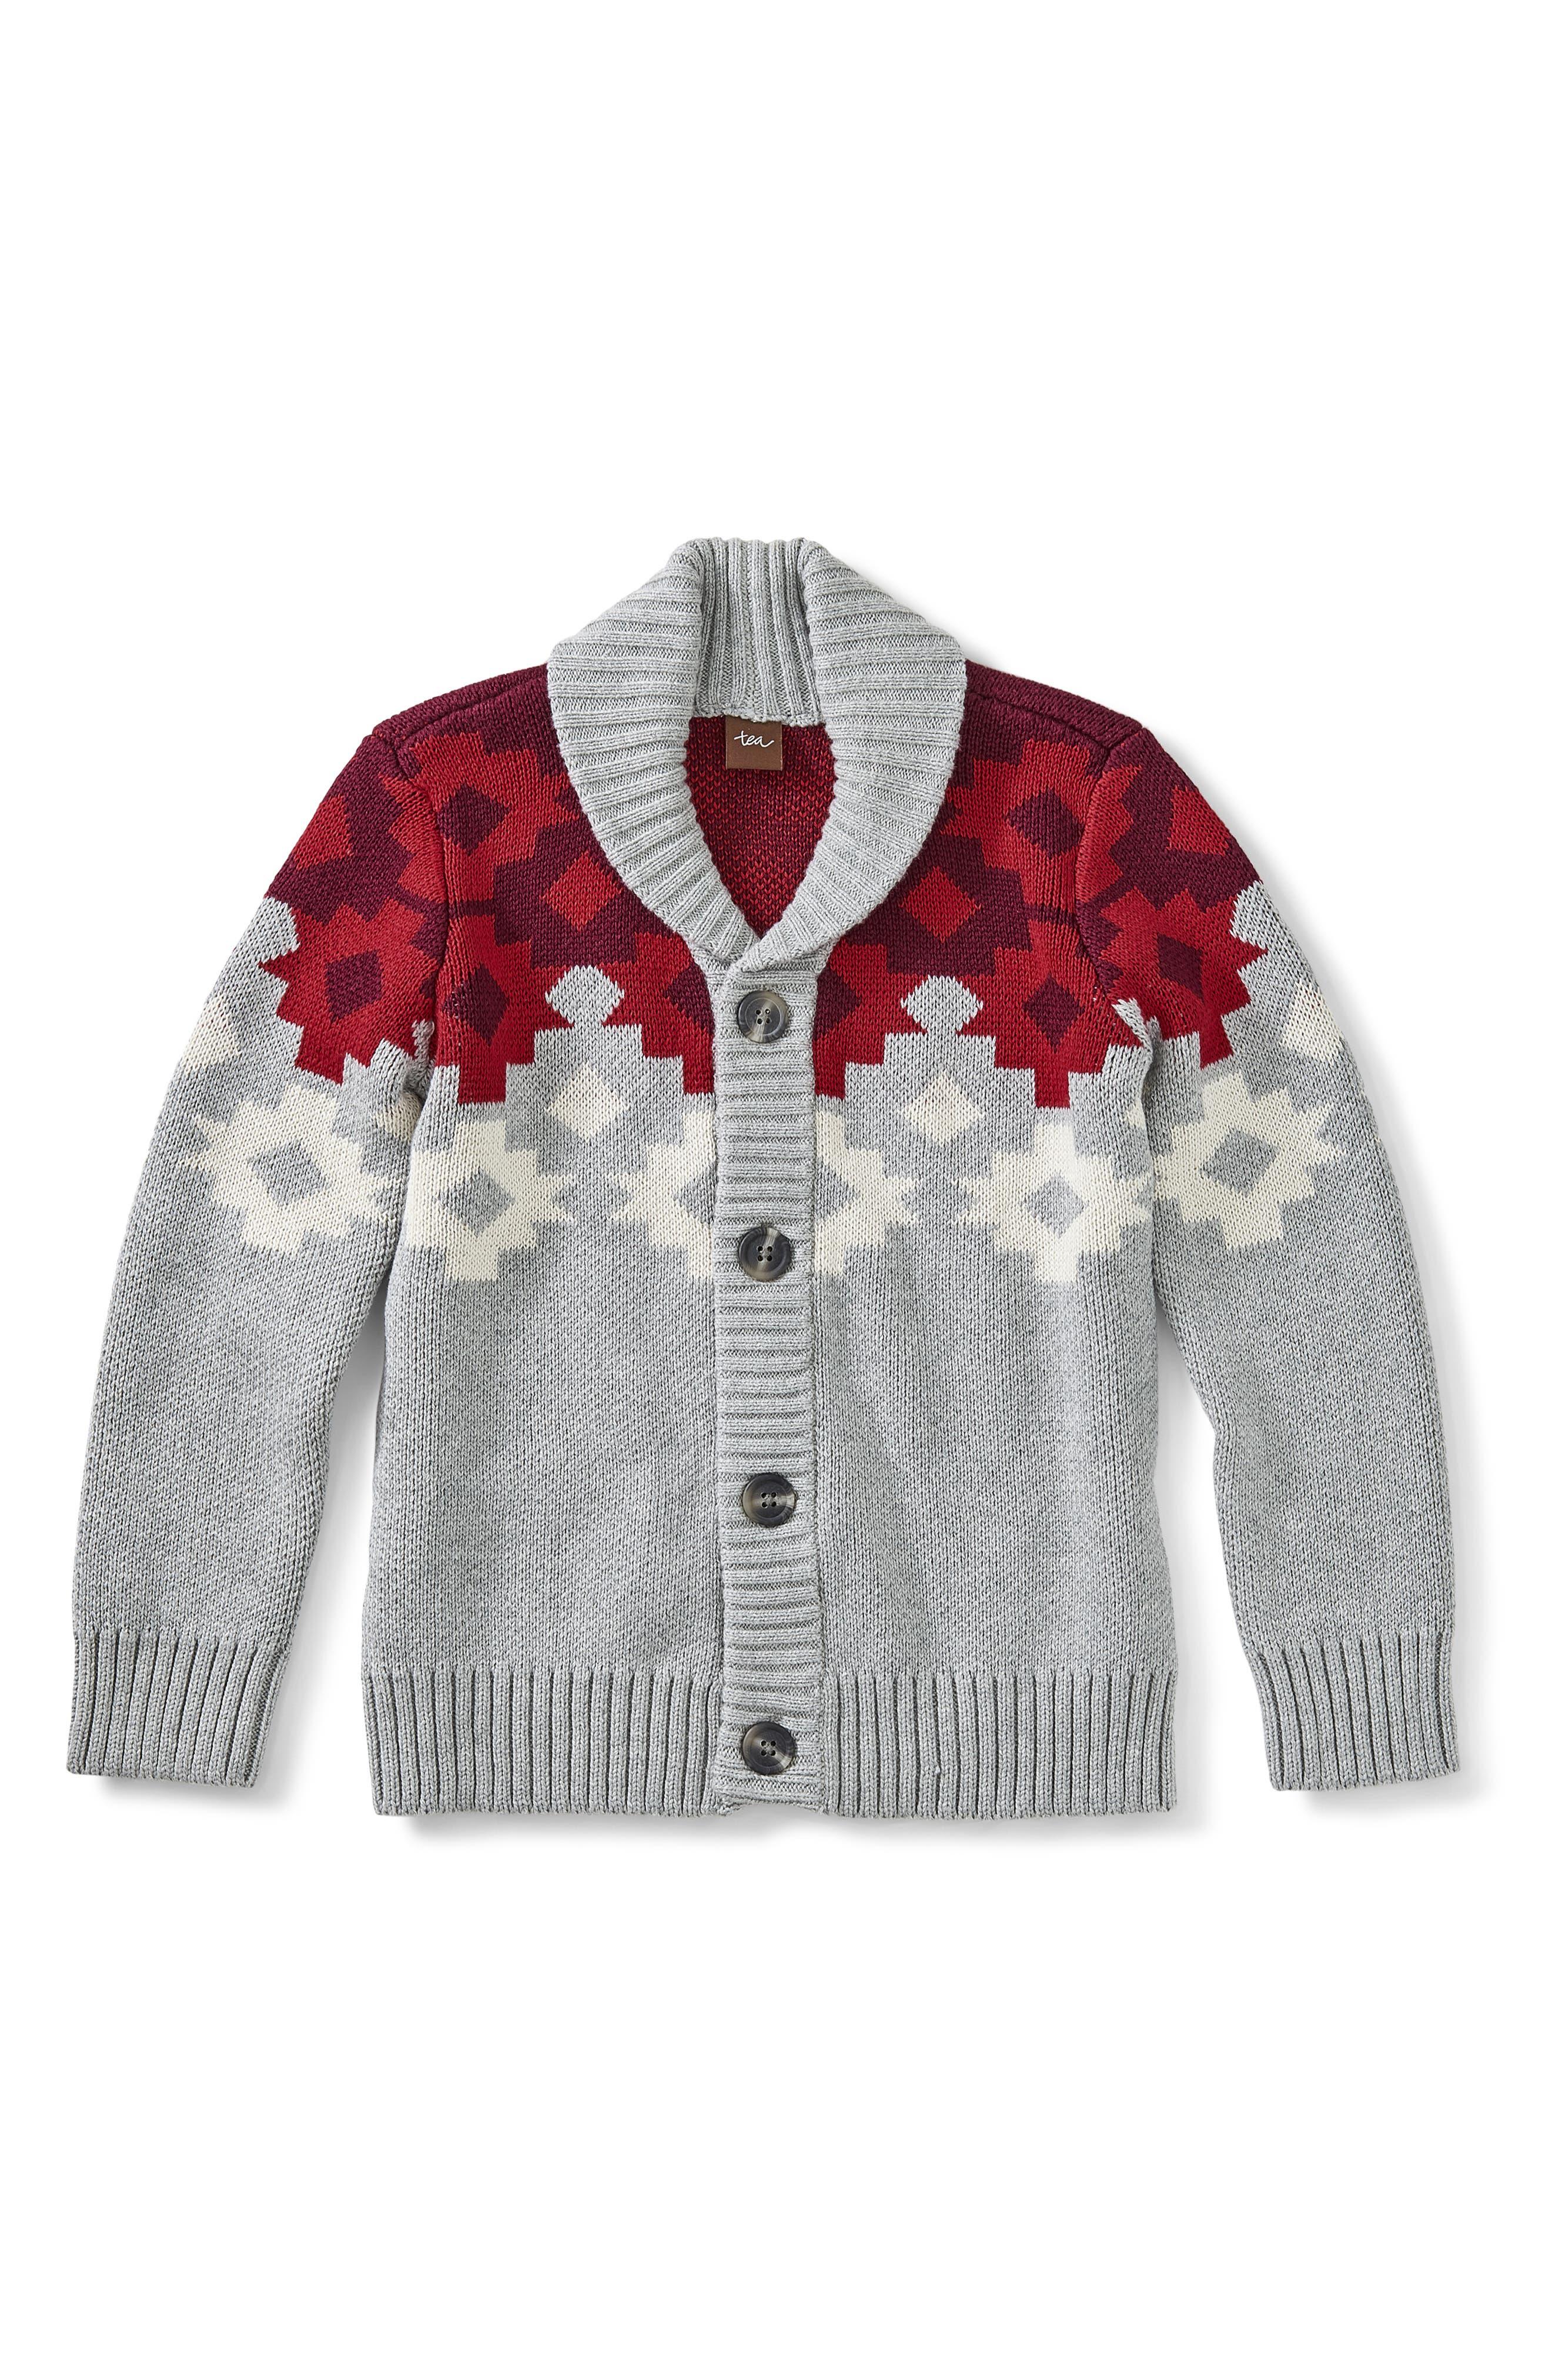 Toddler Boys Tea Collection Ganado Geo Cardigan Size XS (23T)  Grey